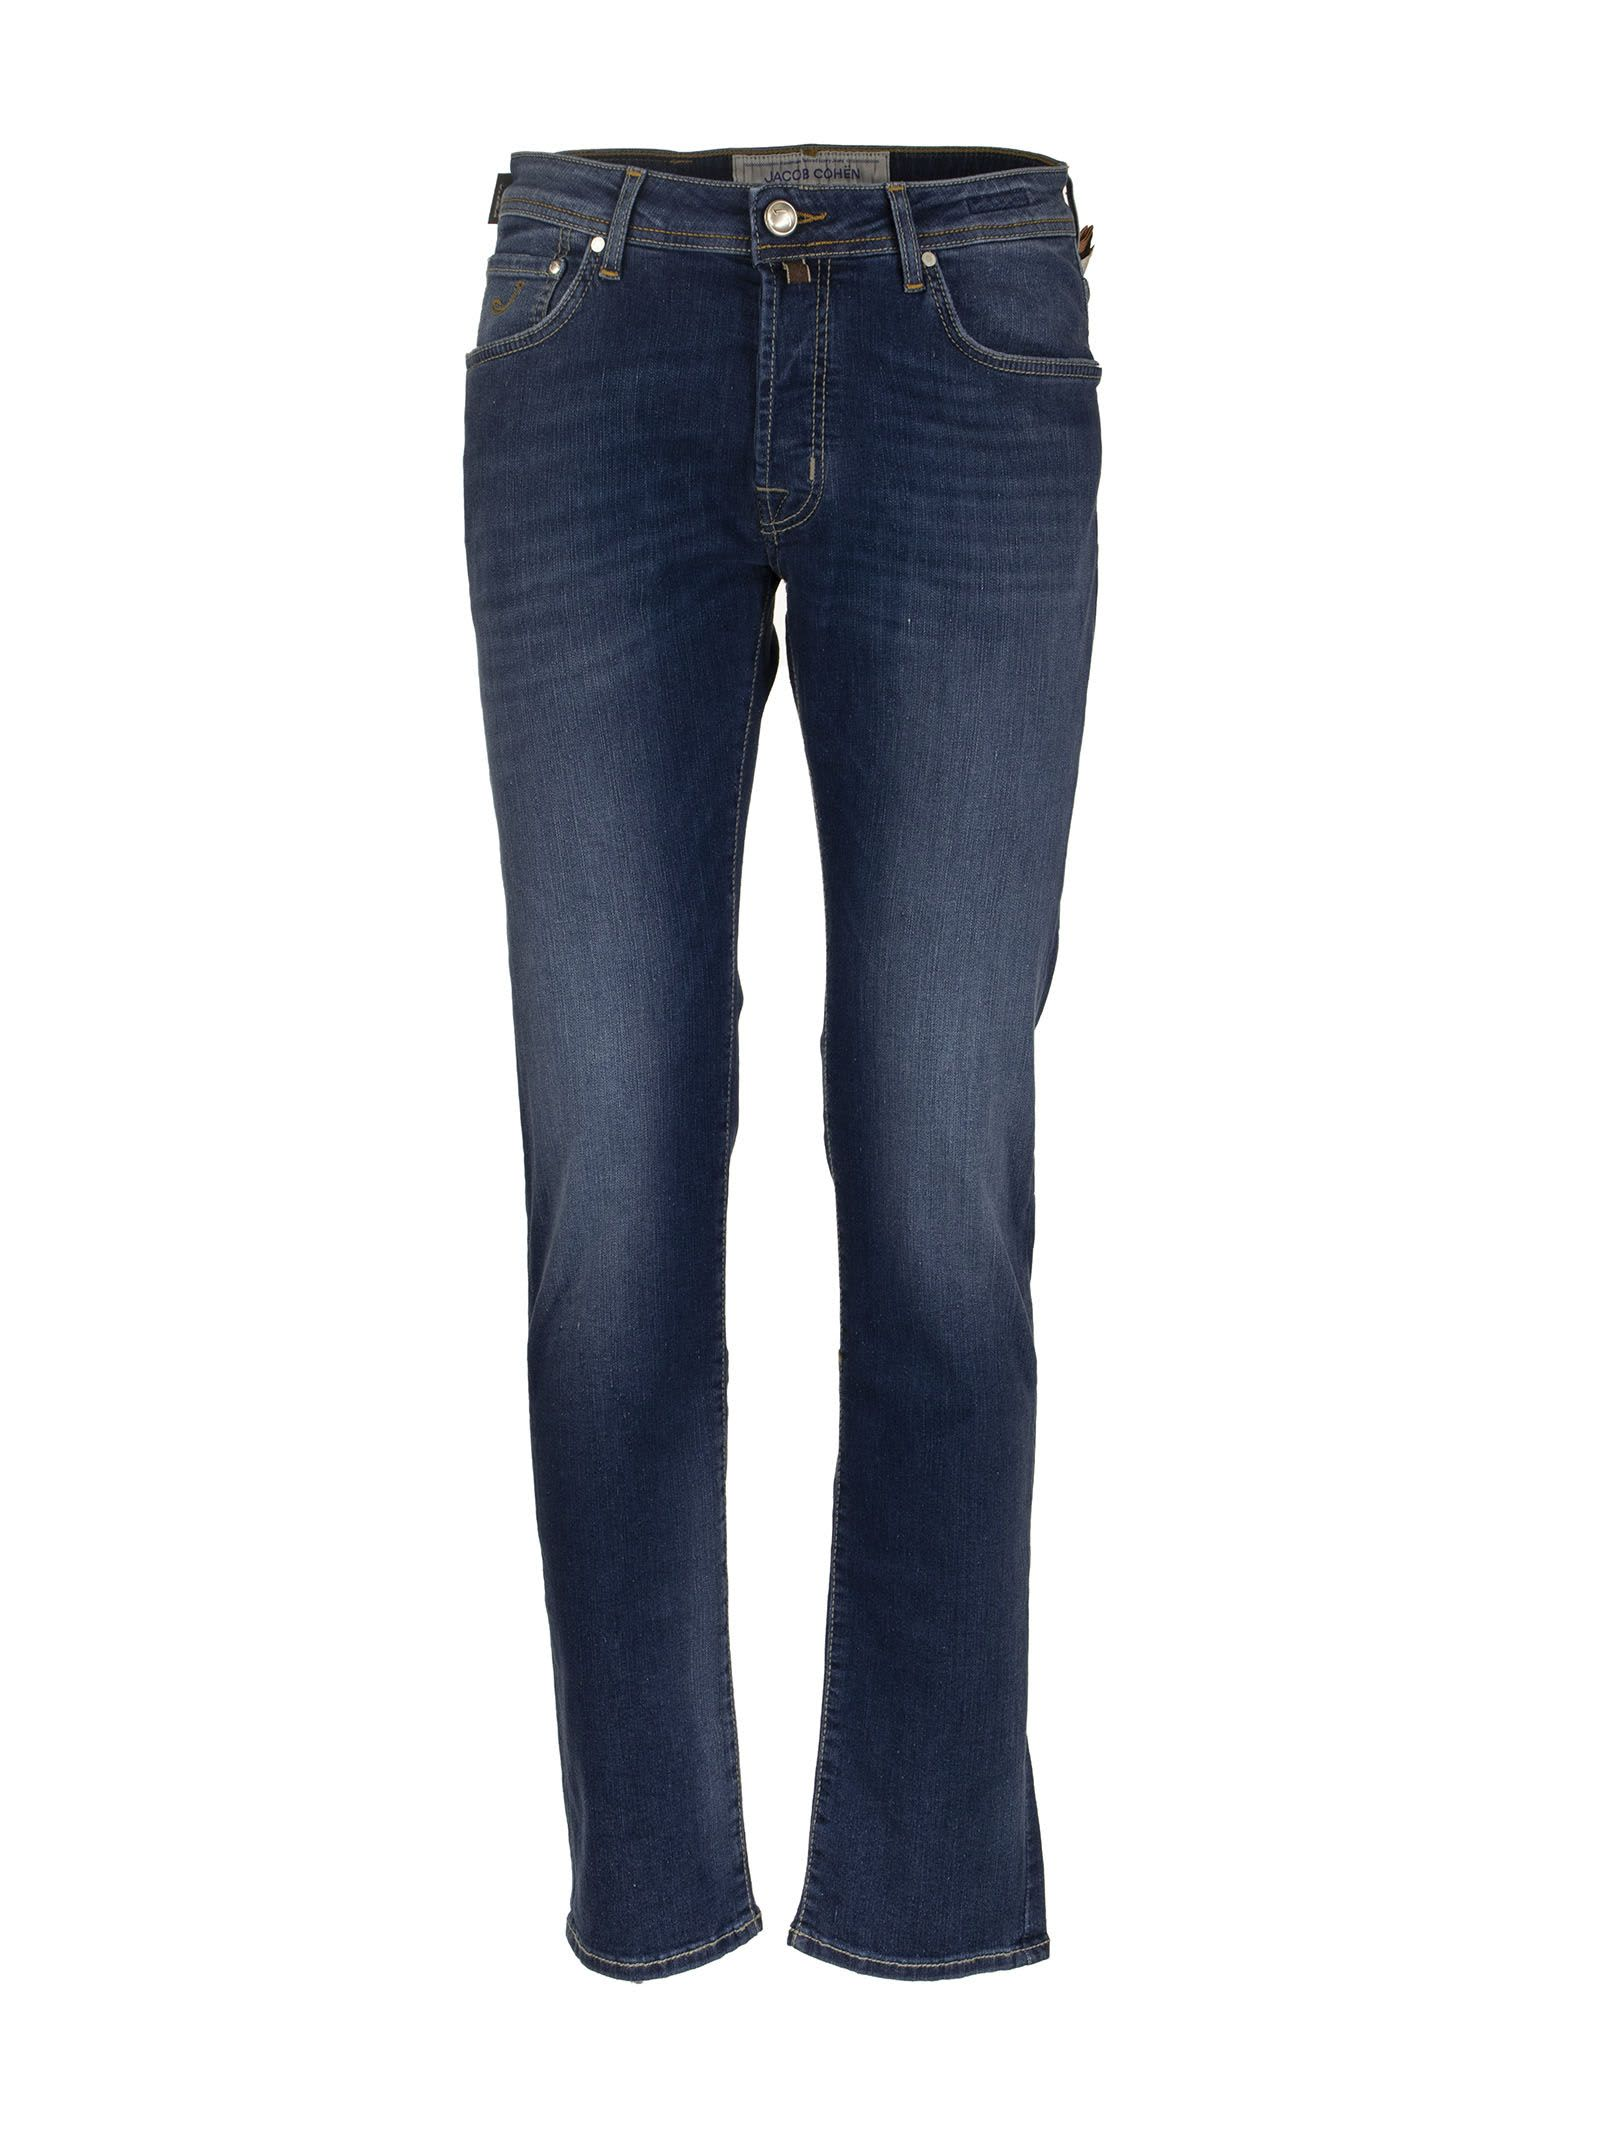 Jacob Cohen Jeans Five Pockets Trousers In Cotton